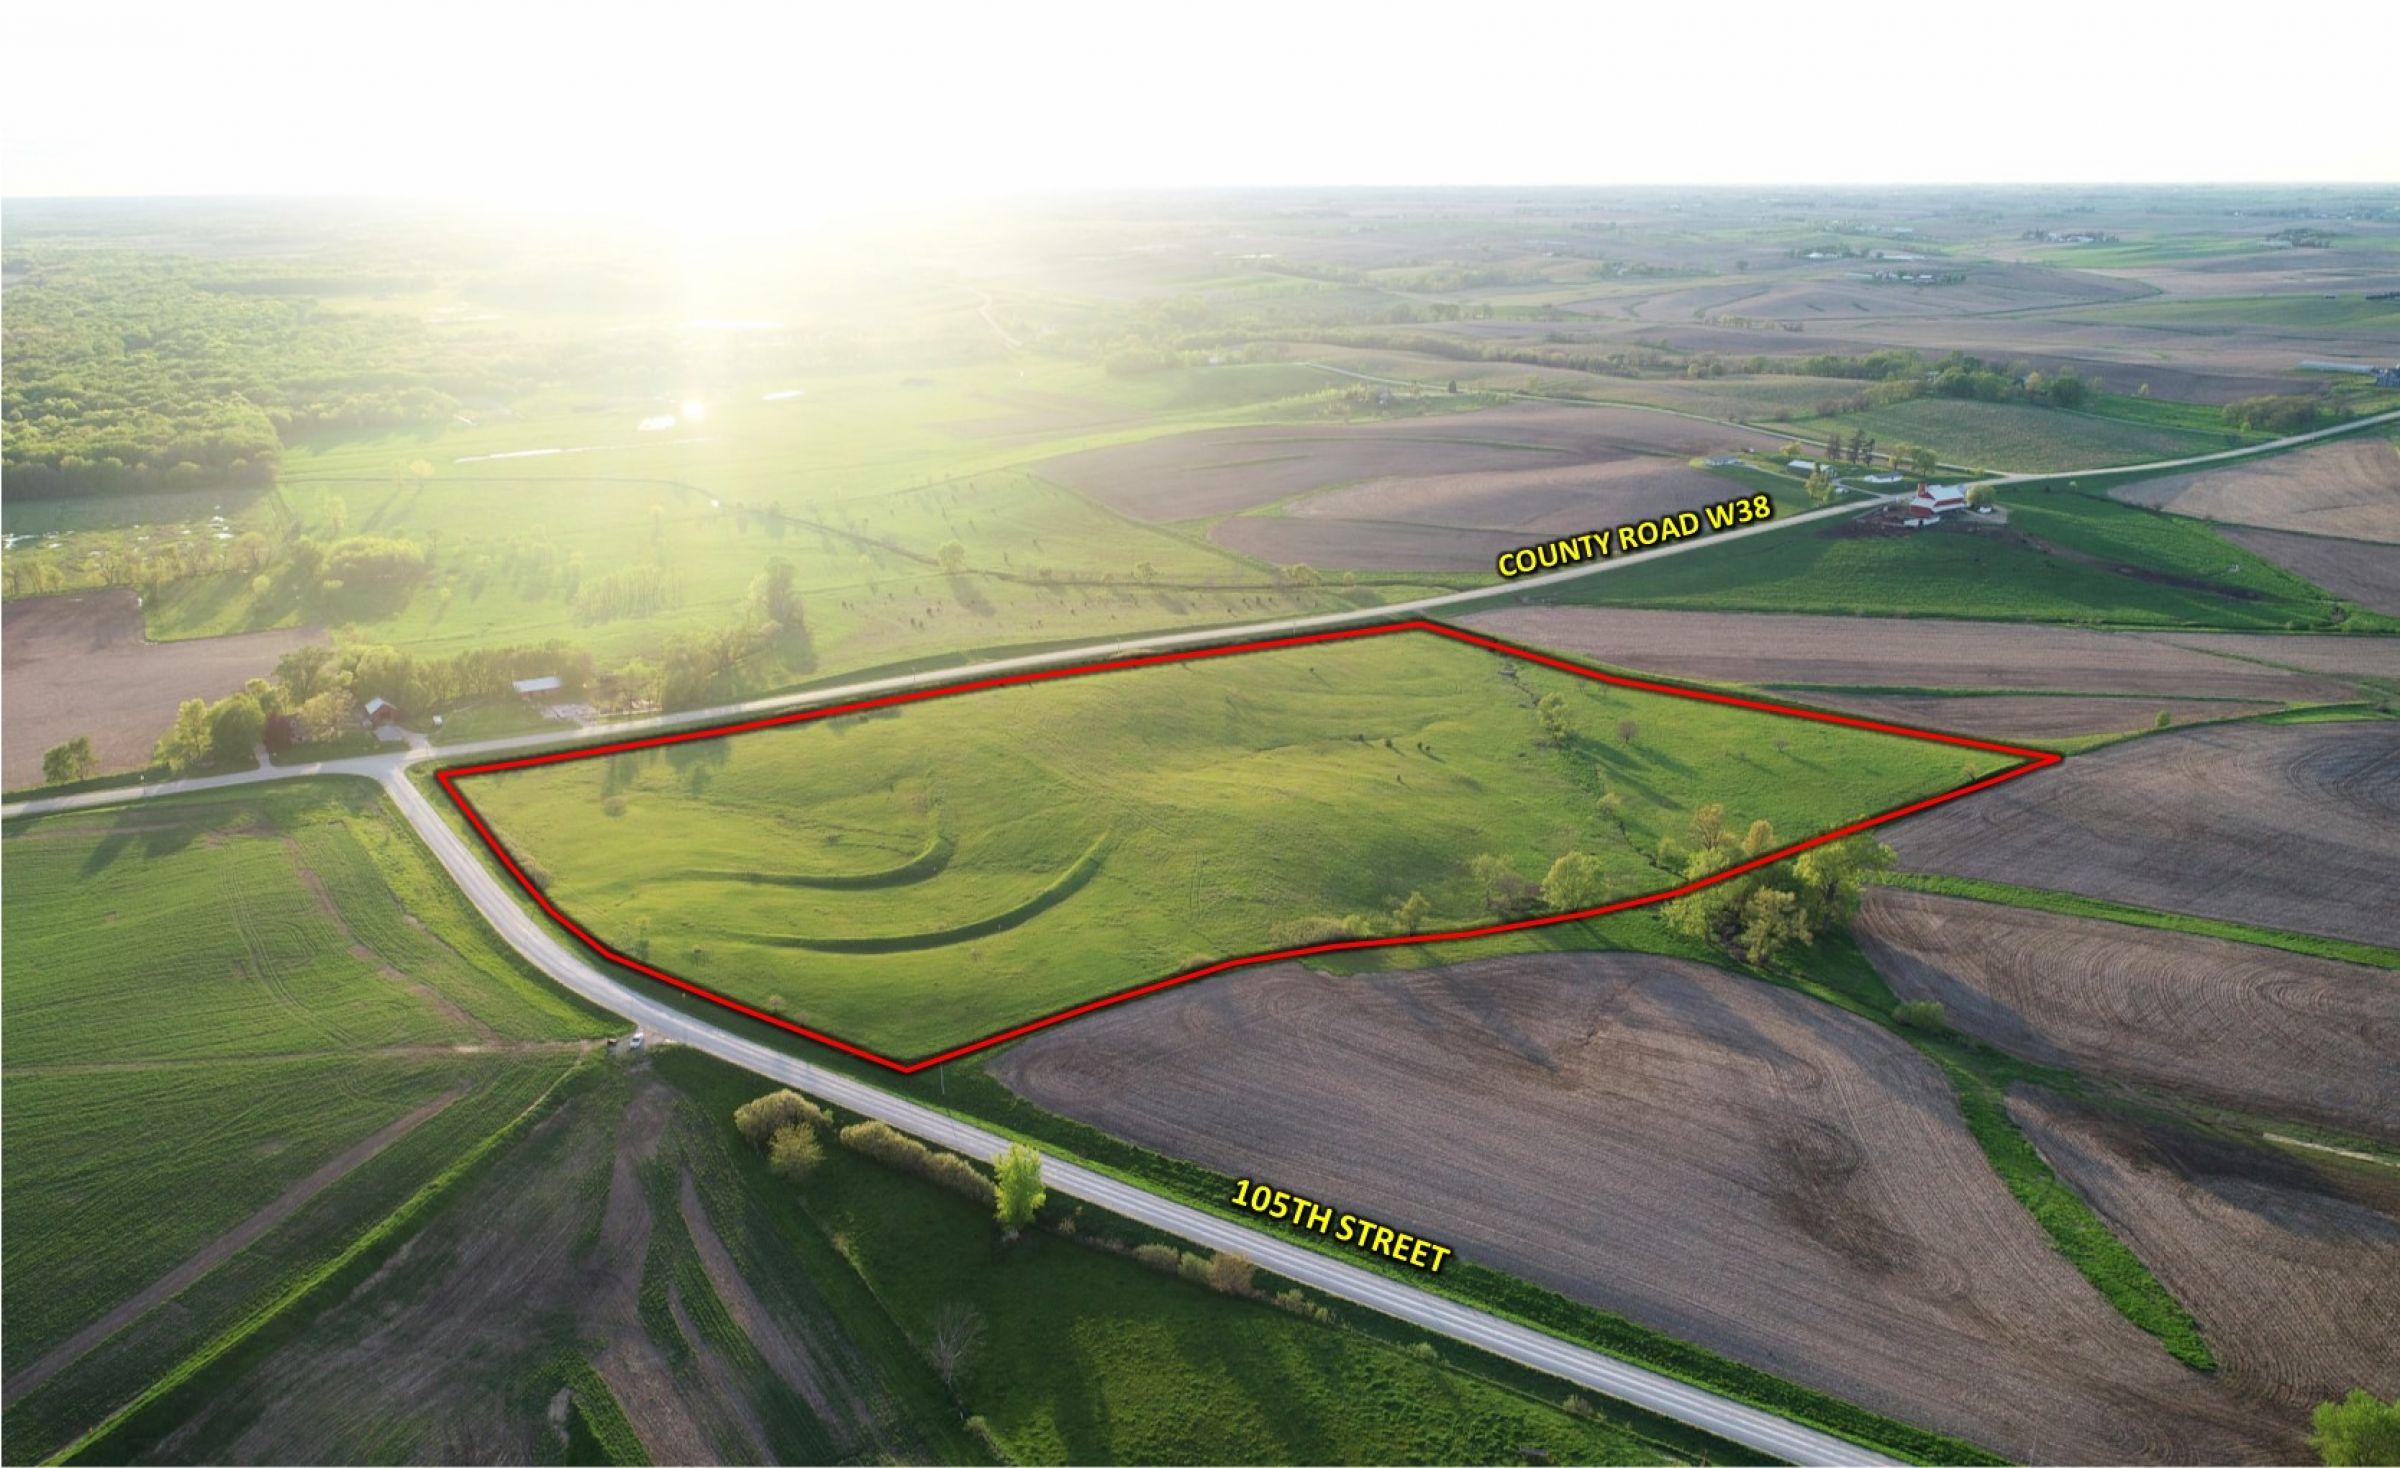 Washington County Iowa Land For Sale 3.jpg